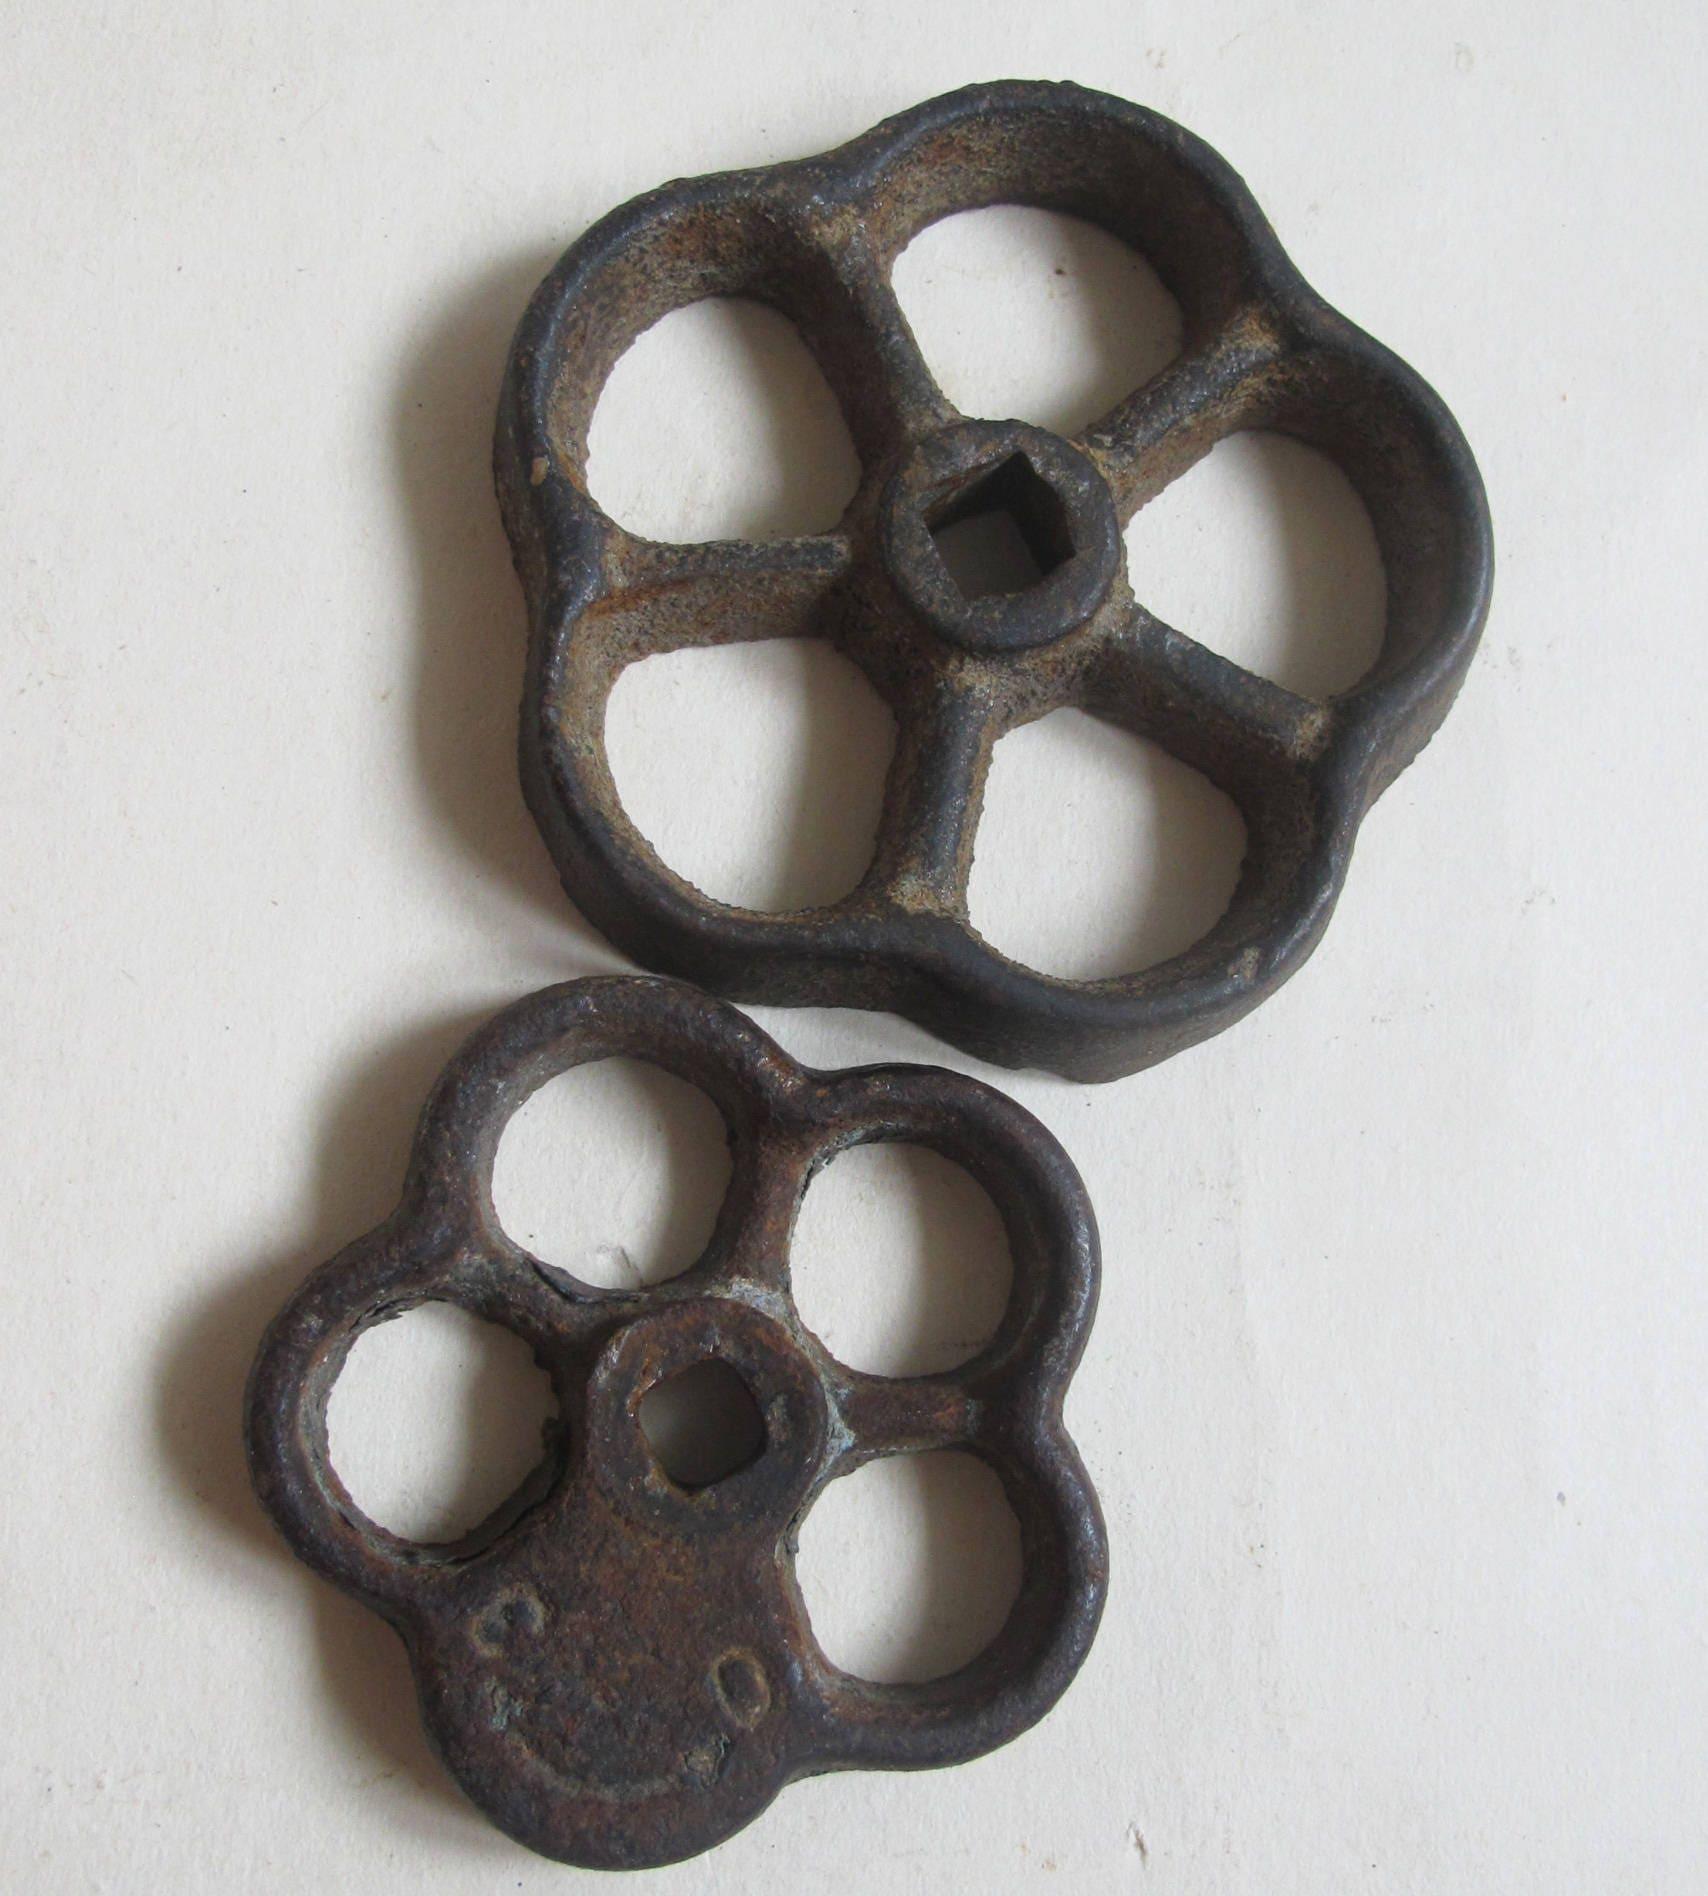 Antique Industrial 2 Valves Handles Cast Iron Soviet Faucet | Etsy